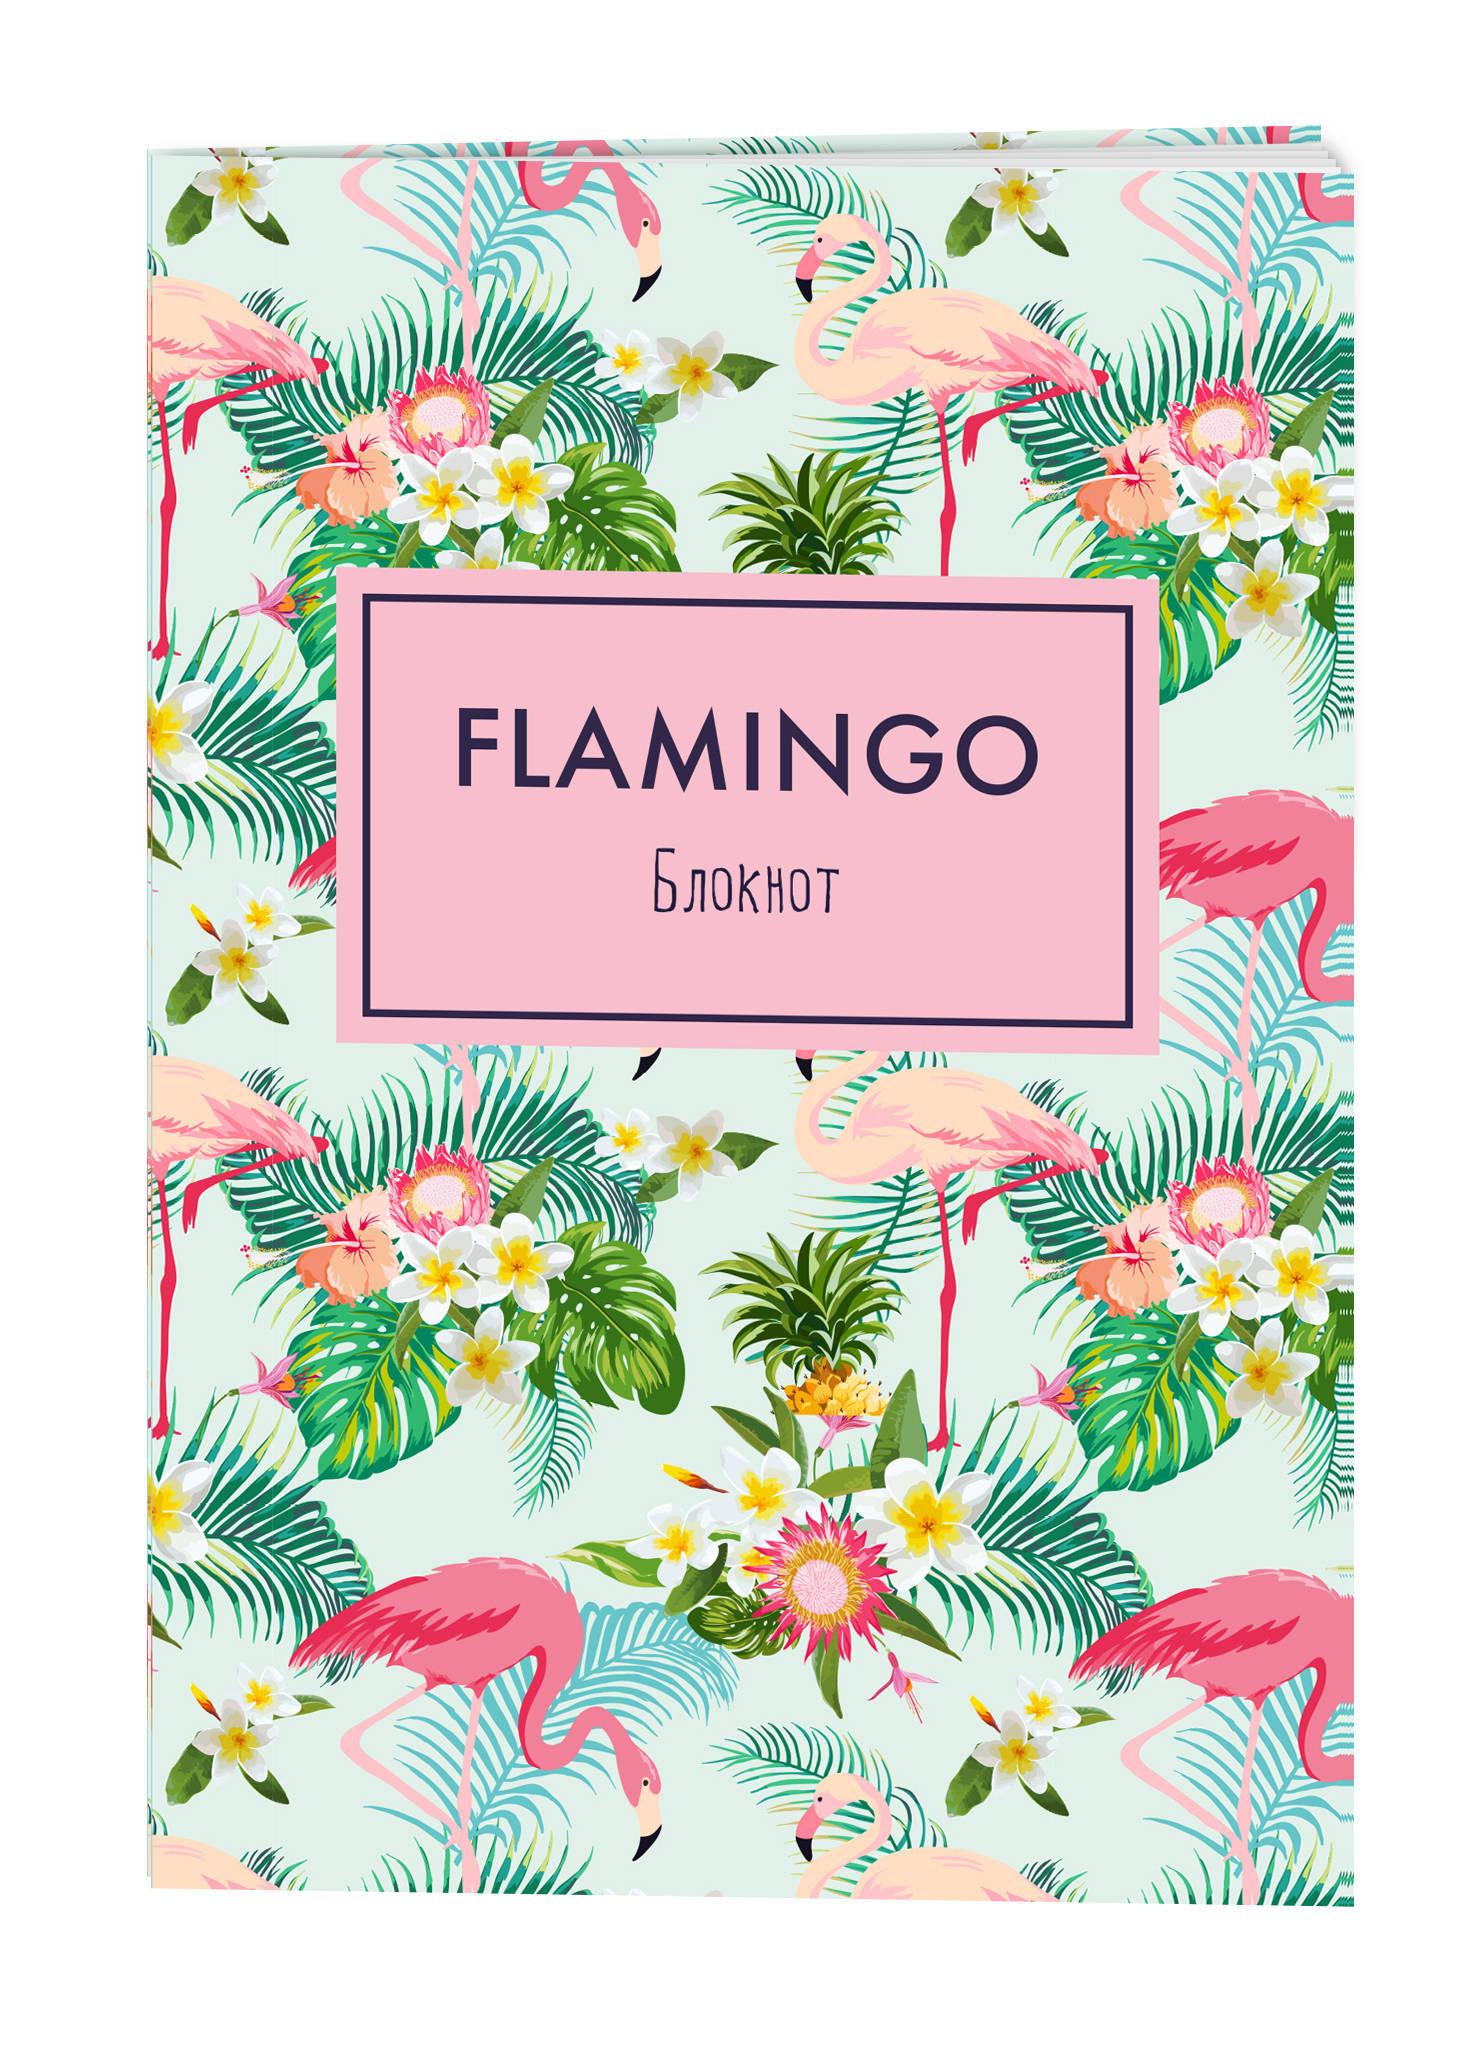 Блокнот. Mindfulness. Фламинго (формат А5, на скобе, фламинго в тропиках) (Арте) блокнот mindfulness фламинго формат а5 на скобе фламинго на белом 72 стр